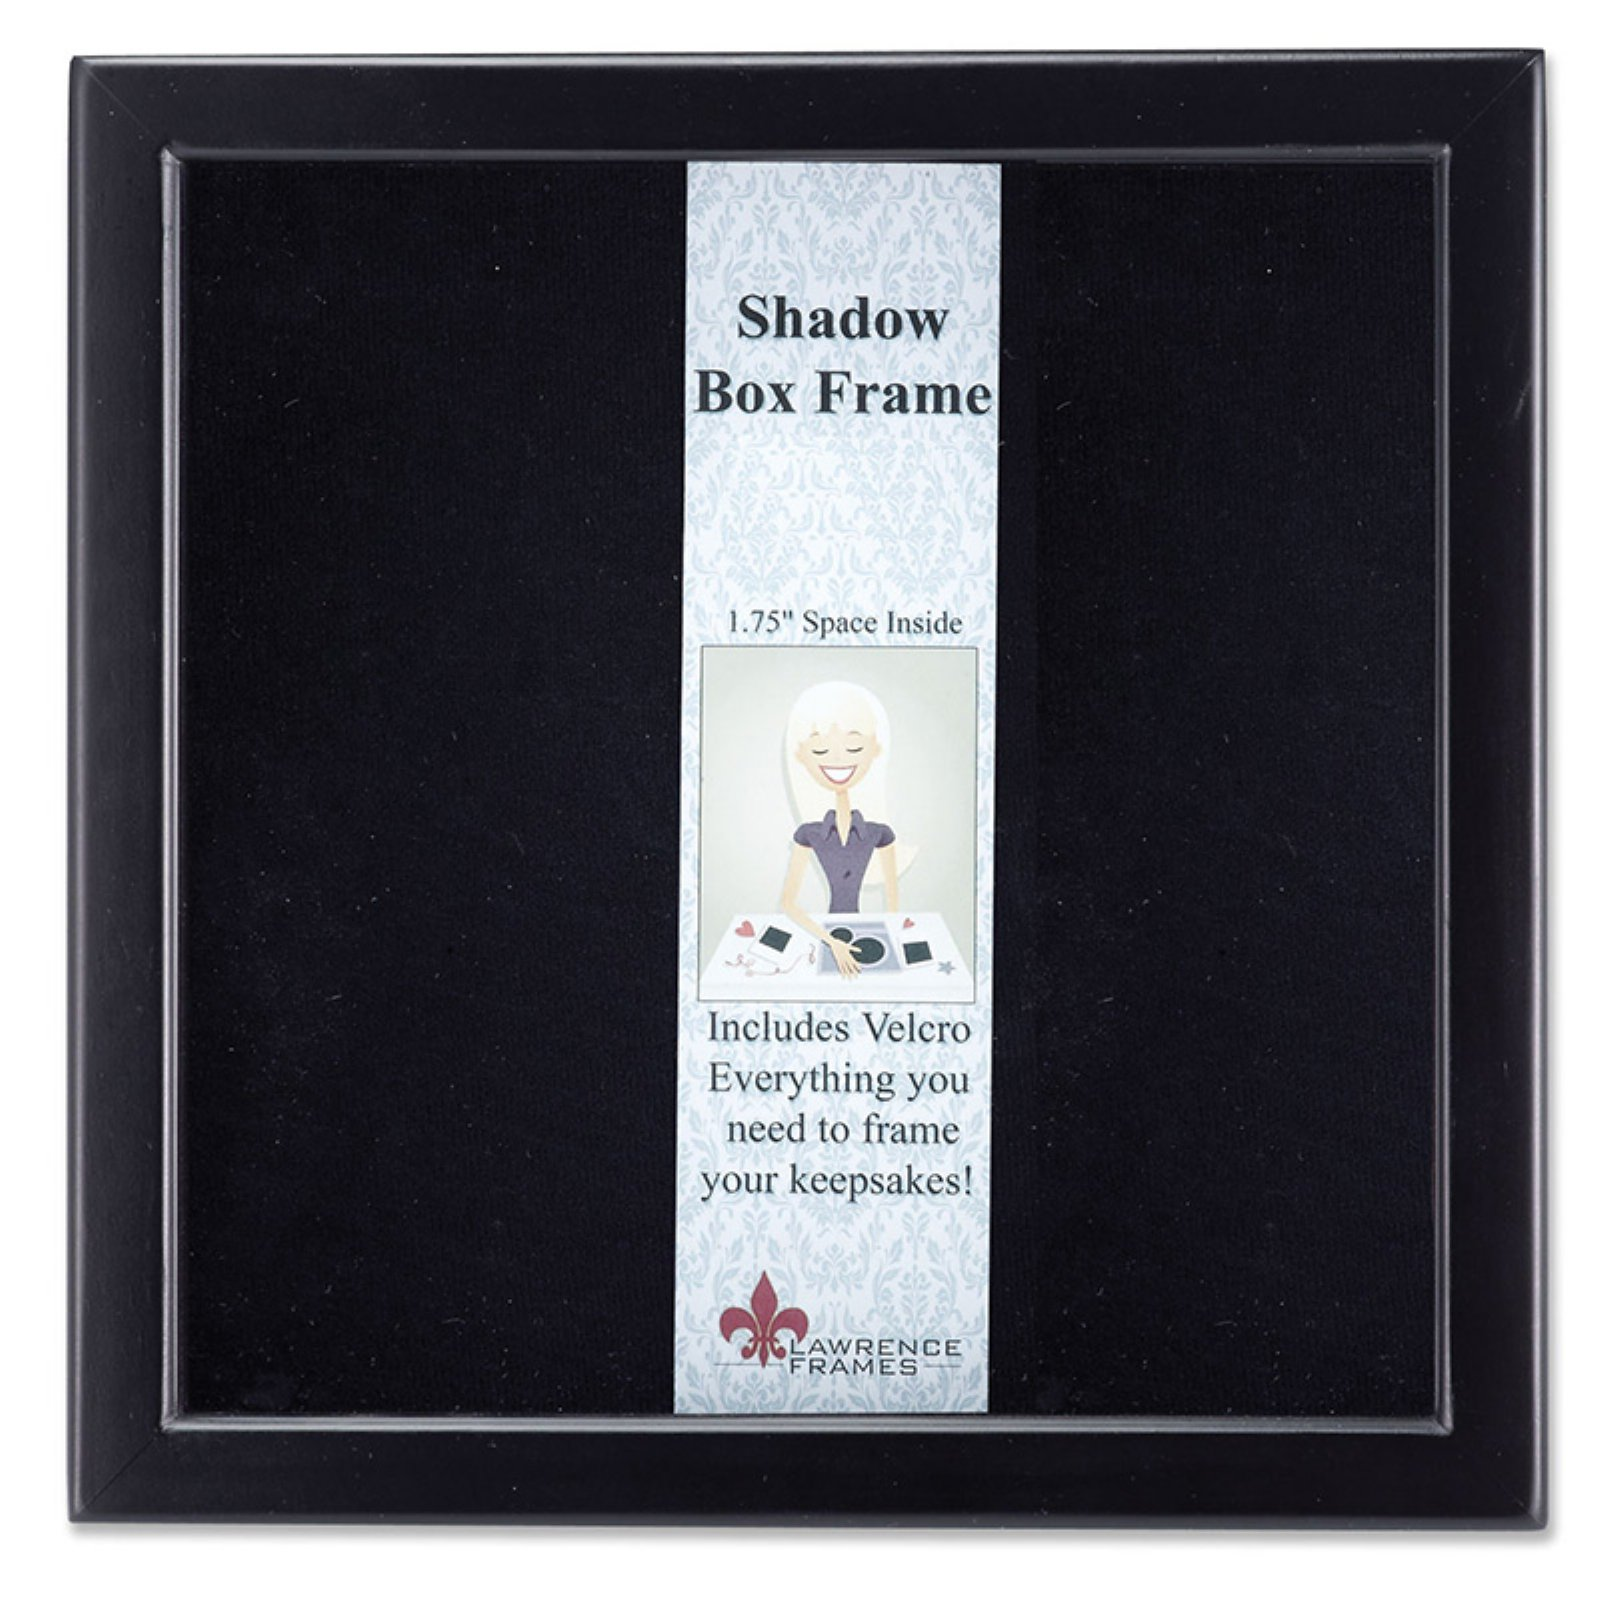 790188 espresso wood shadow box 8x8 picture frame walmart jeuxipadfo Image collections